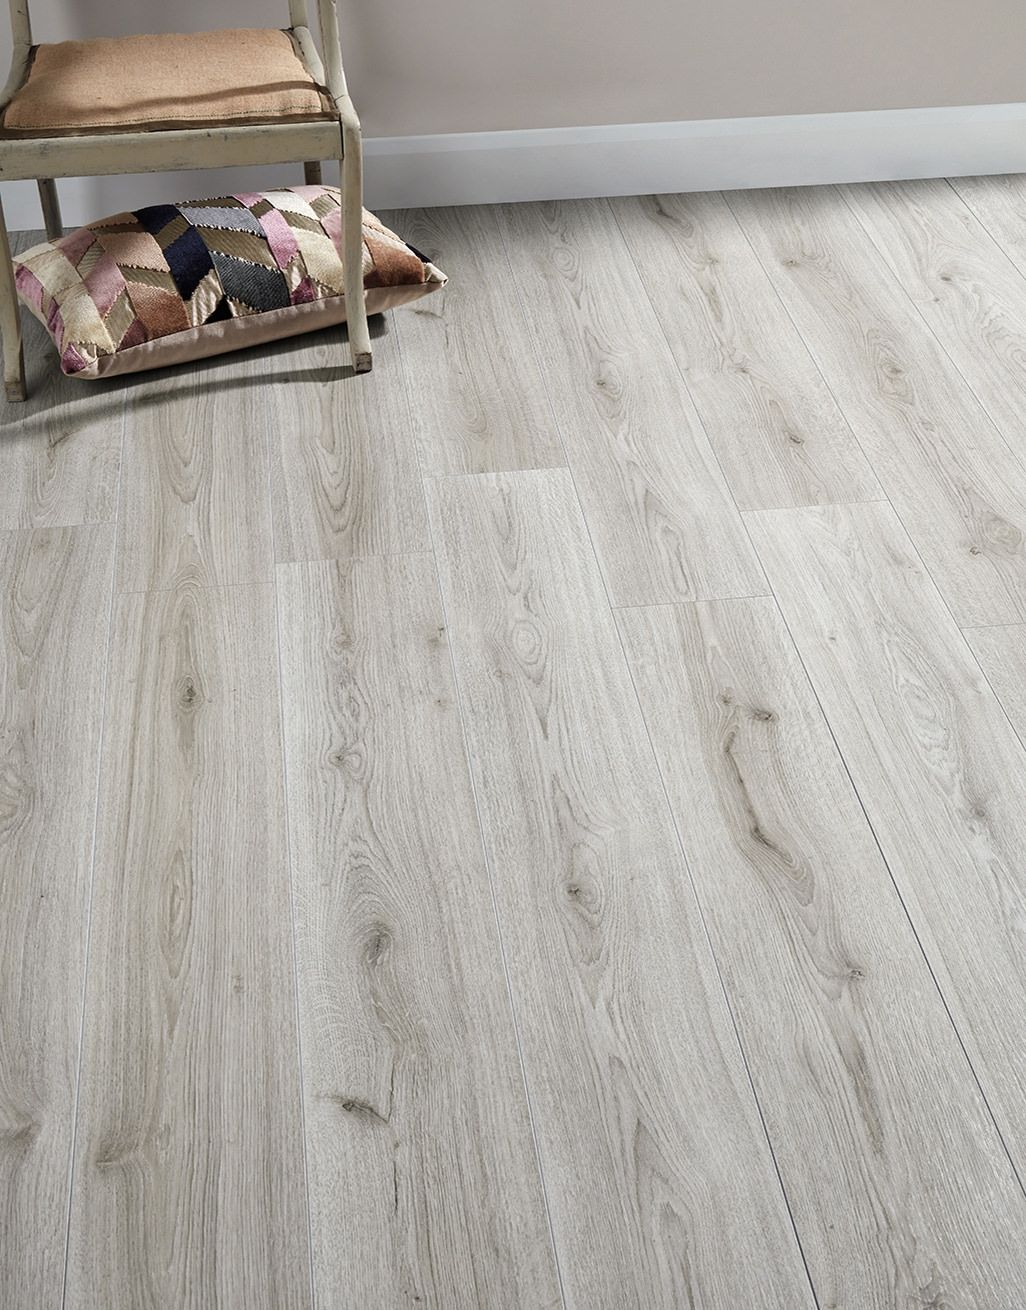 Loft Light Grey Laminate Flooring, Light Grey Oak Effect Laminate Flooring